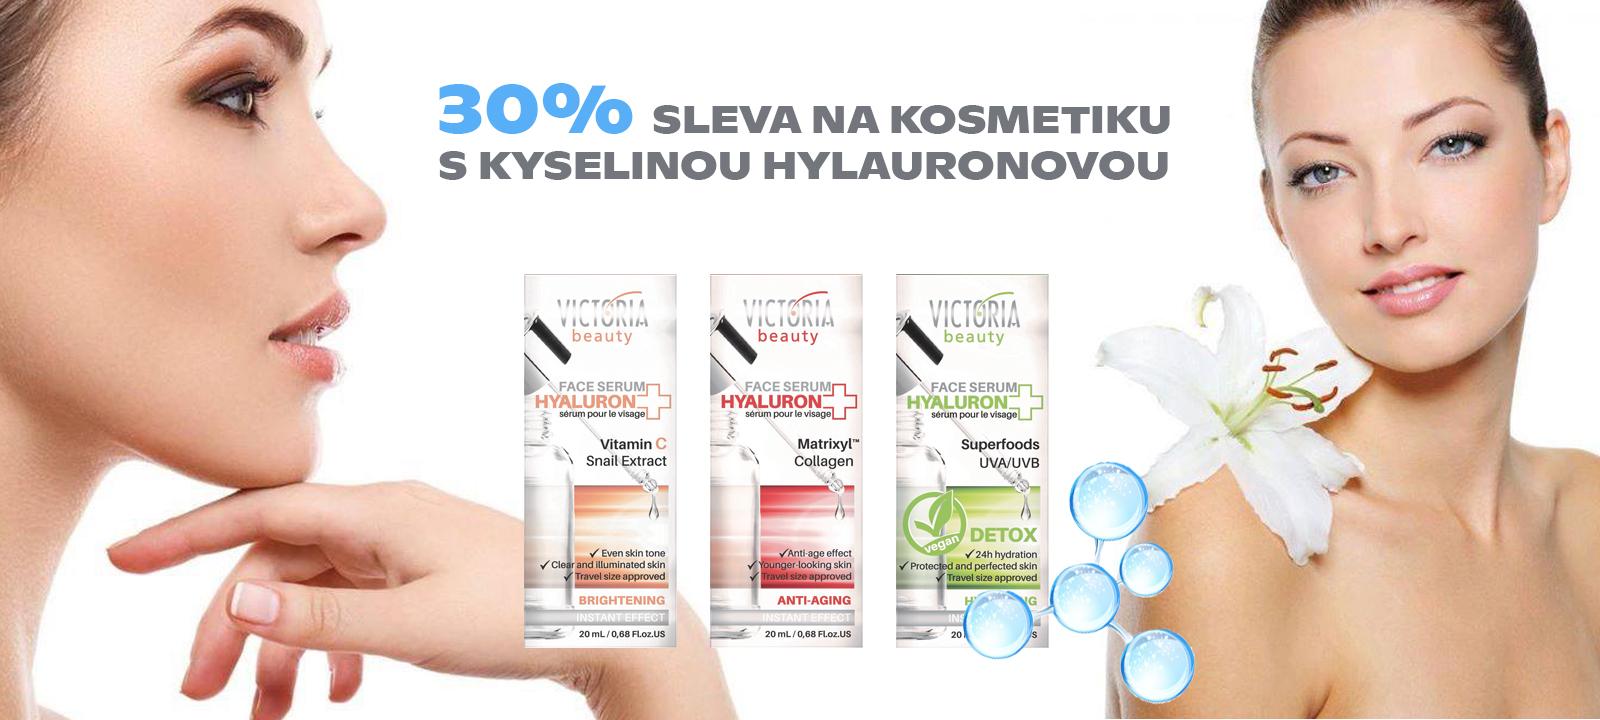 30% SLEVA na kosmetiku s kyselinou hyaluronovou